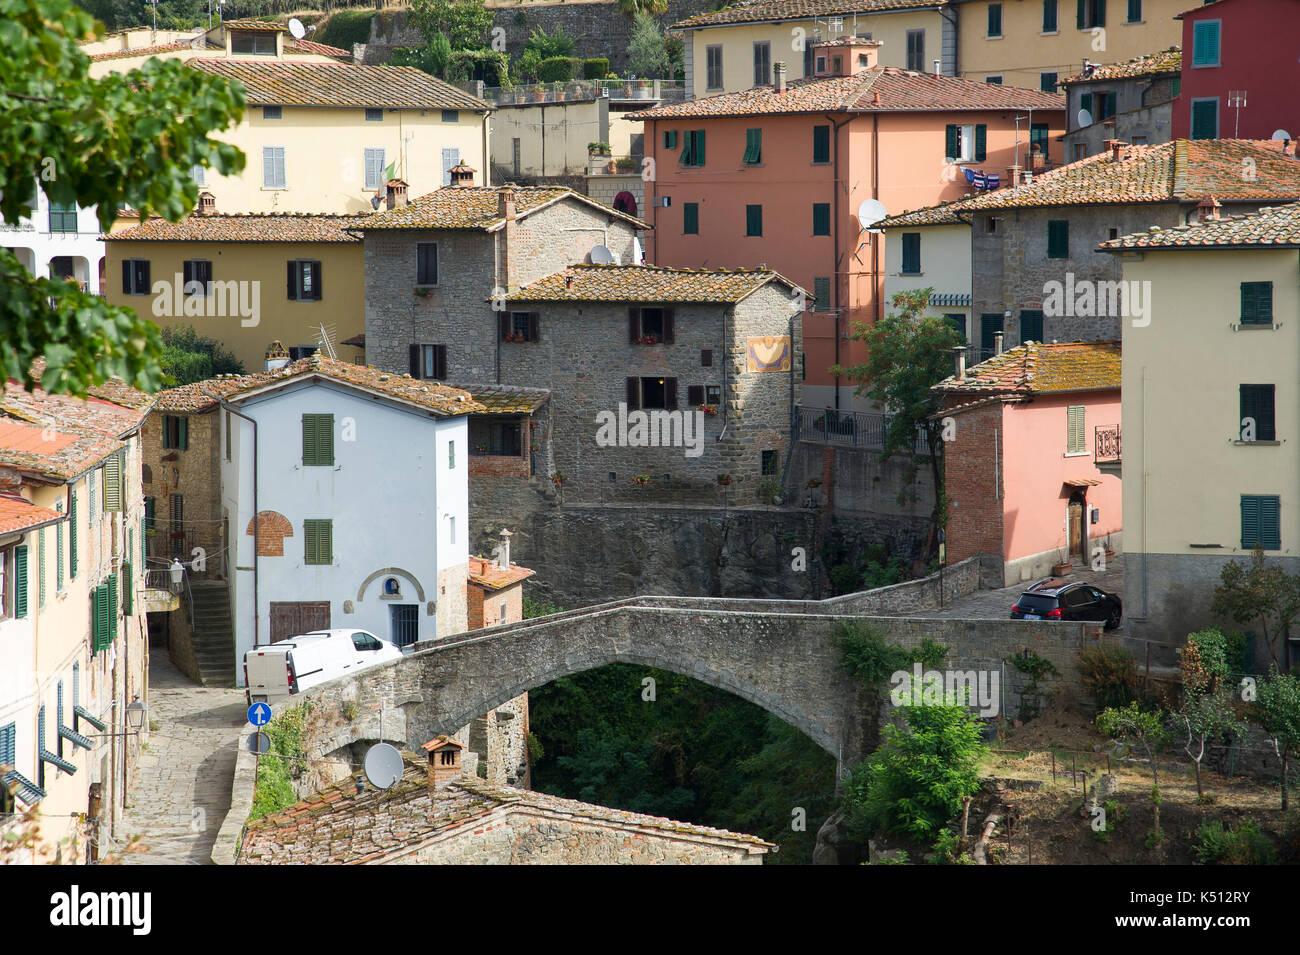 Ponte romanico (Roman bridge) in Old town in Loro Ciuffenna, Tuscany, Italy. 1 September 2017 © Wojciech Strozyk / Alamy Stock Photo - Stock Image